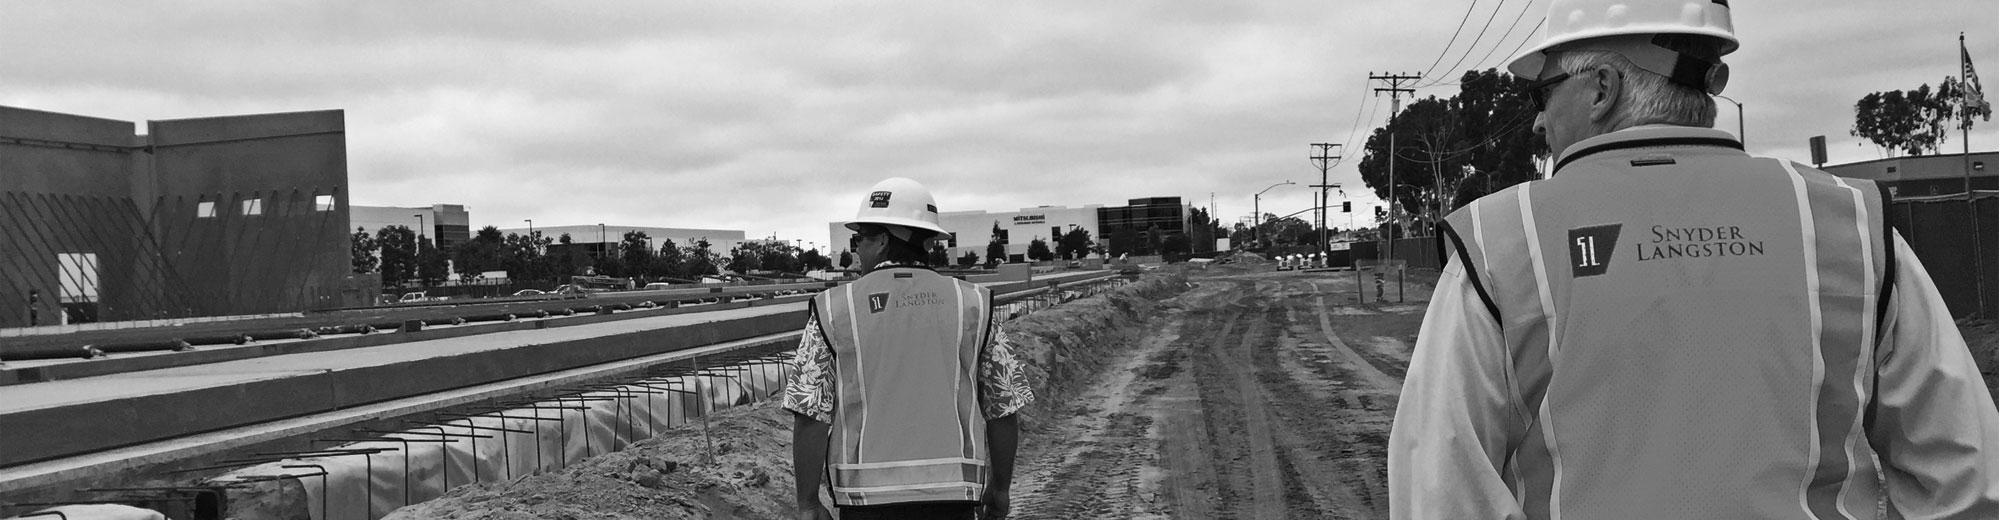 Master builder snyder langston for Langston builders